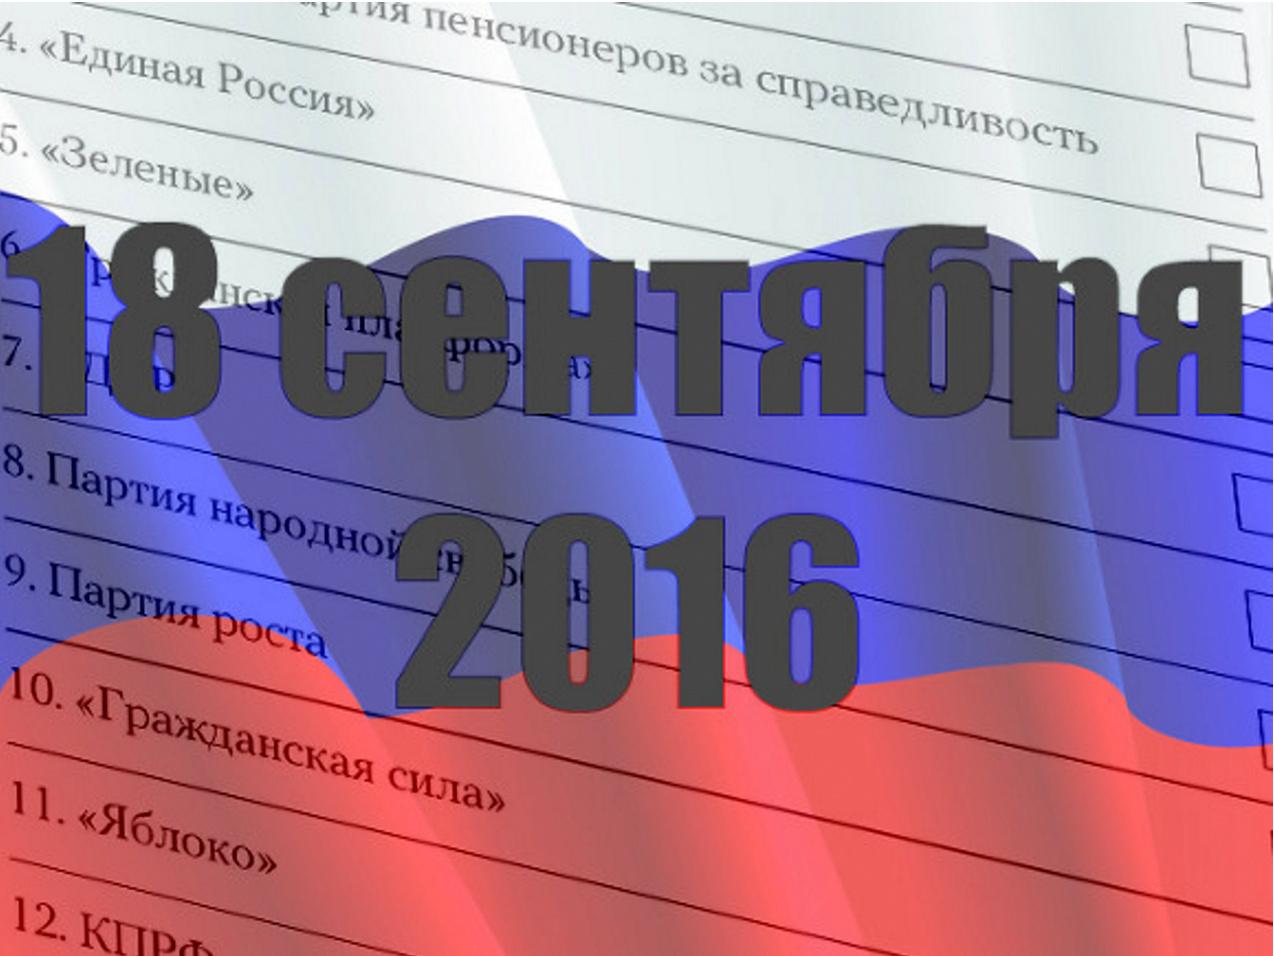 snimok-ekrana-2016-09-28-v-23-03-54-png